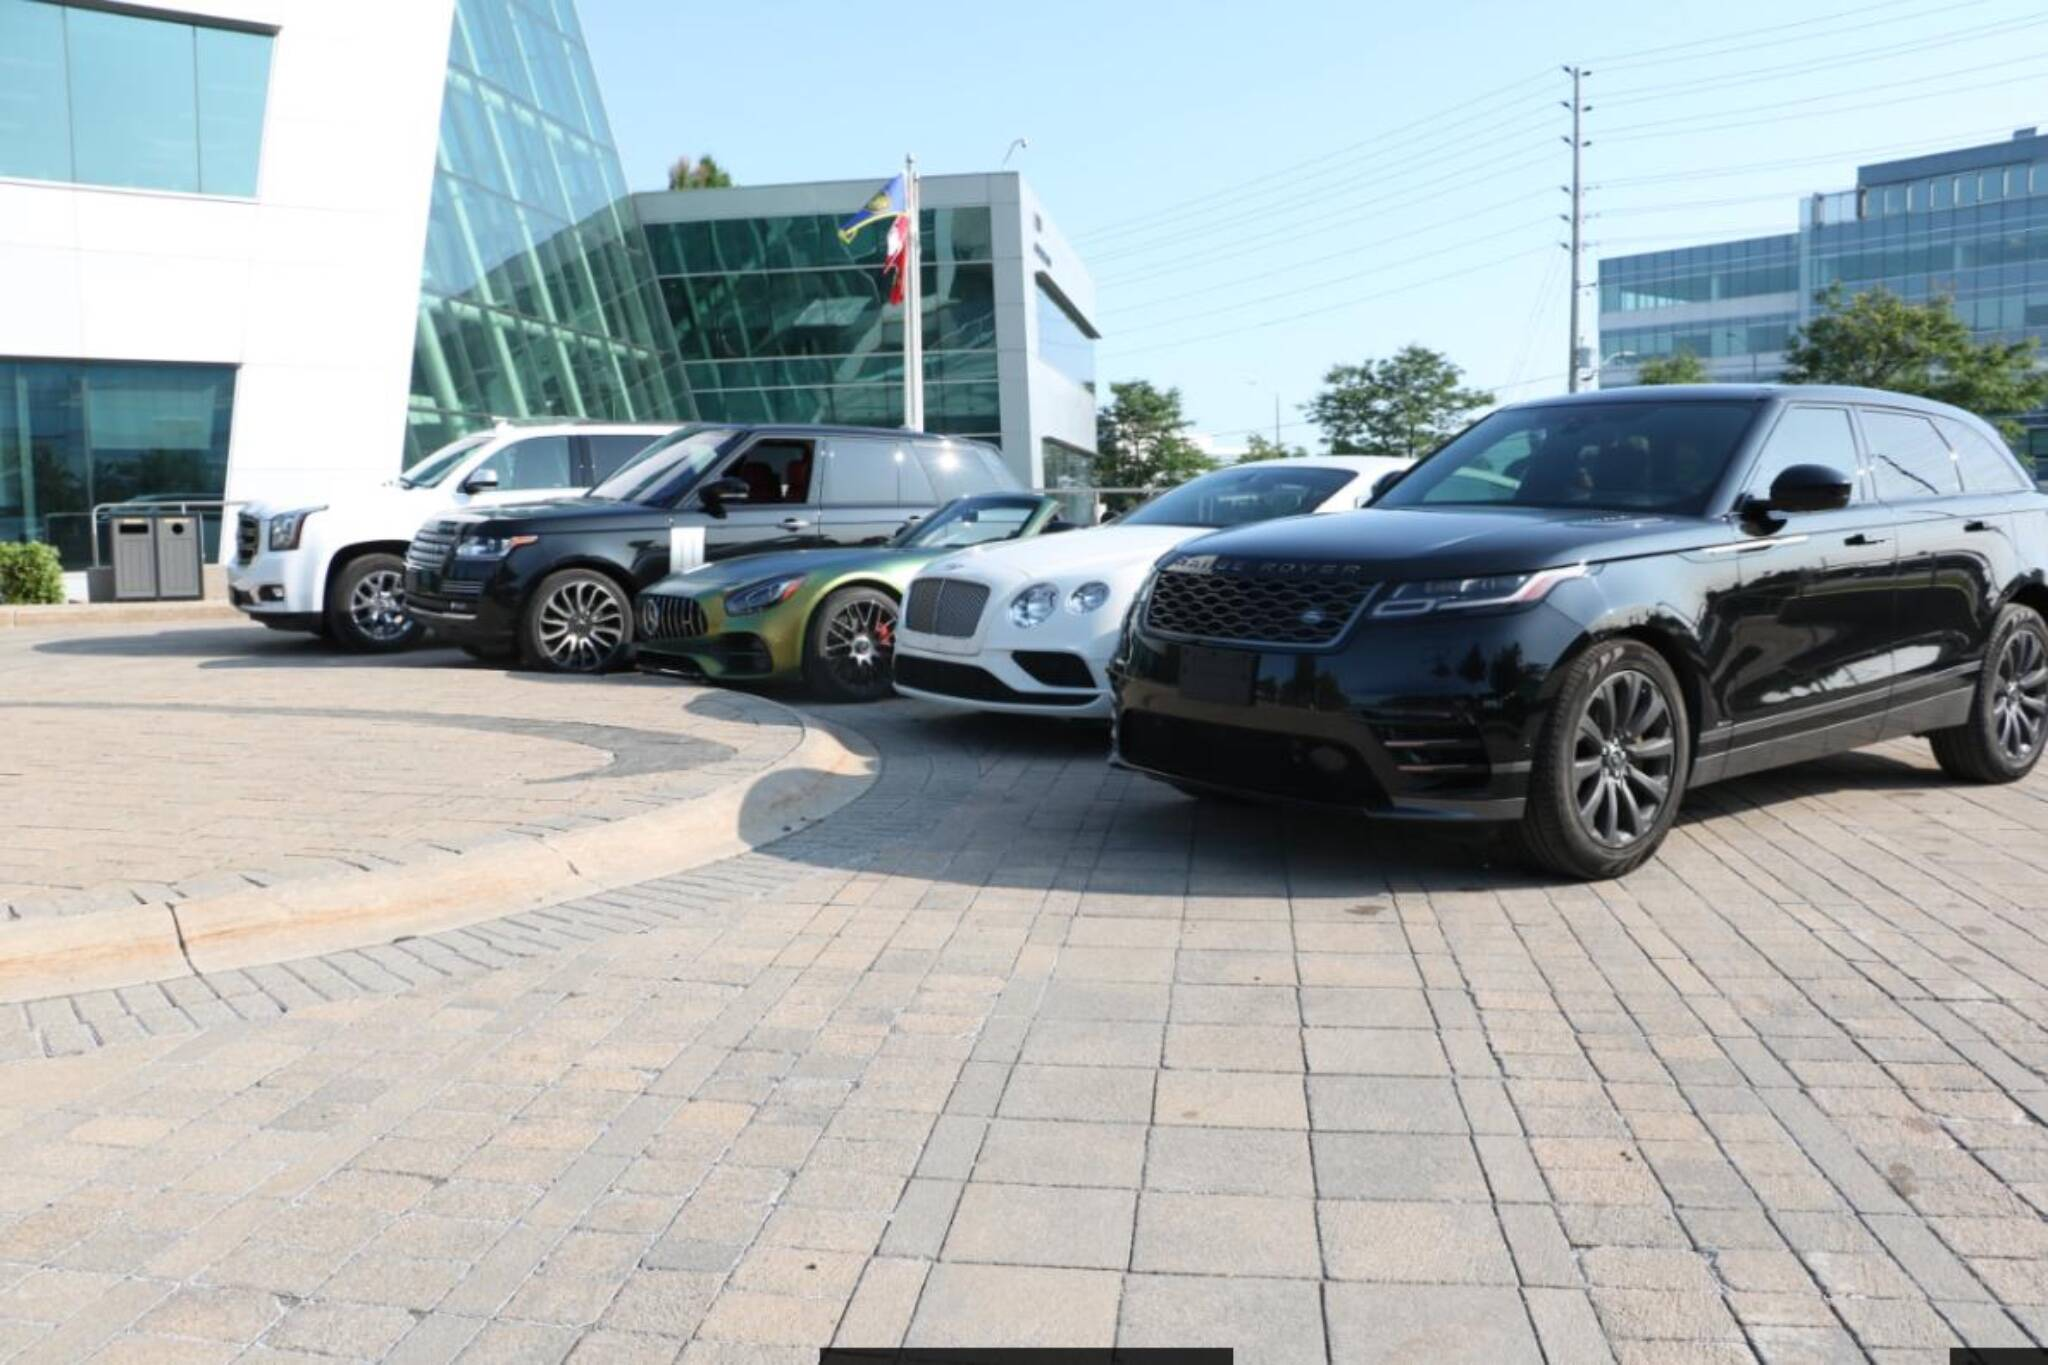 stolen cars police investigation